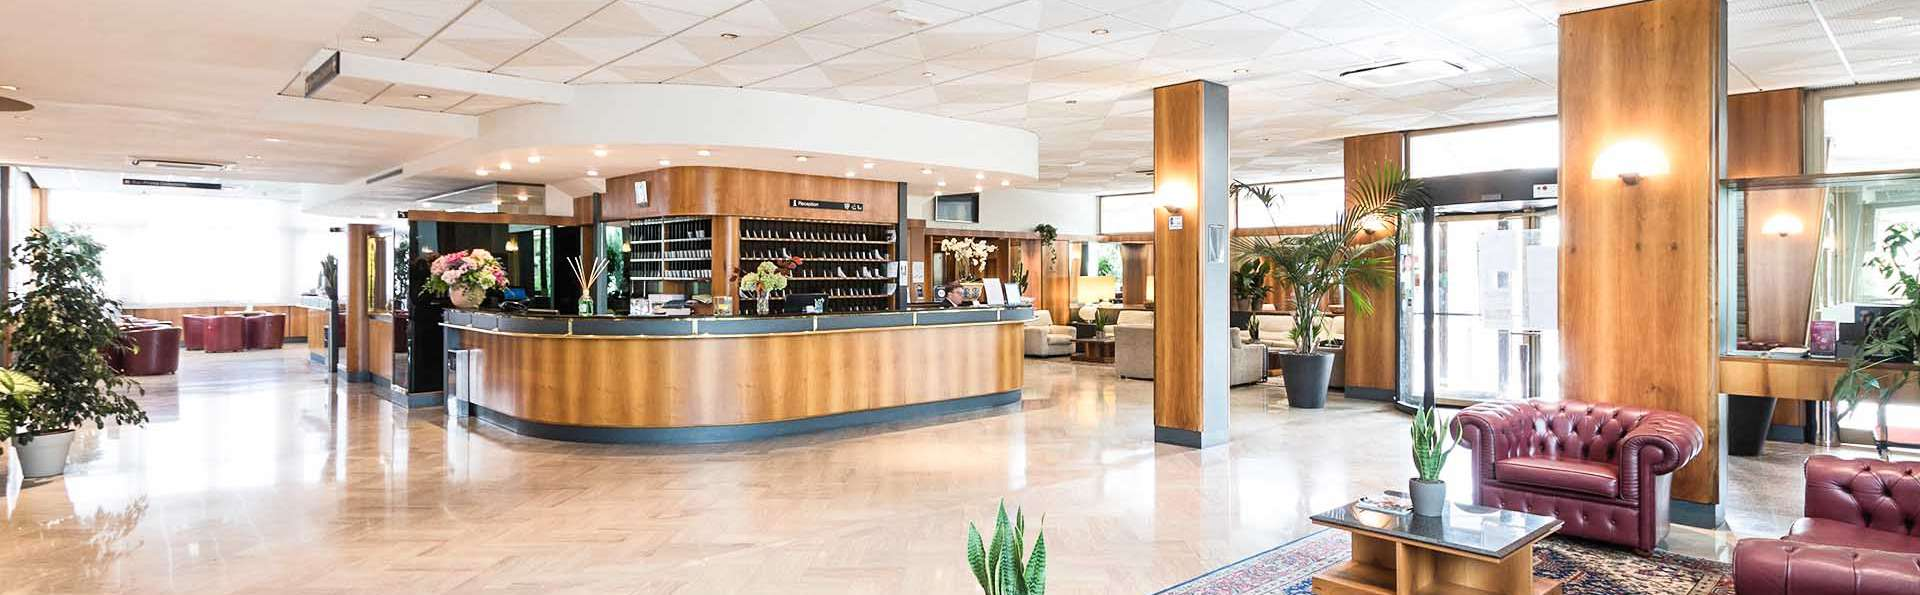 Hotel Minerva - EDIT_lobby-hotel-minerva-arezzo_01.jpg